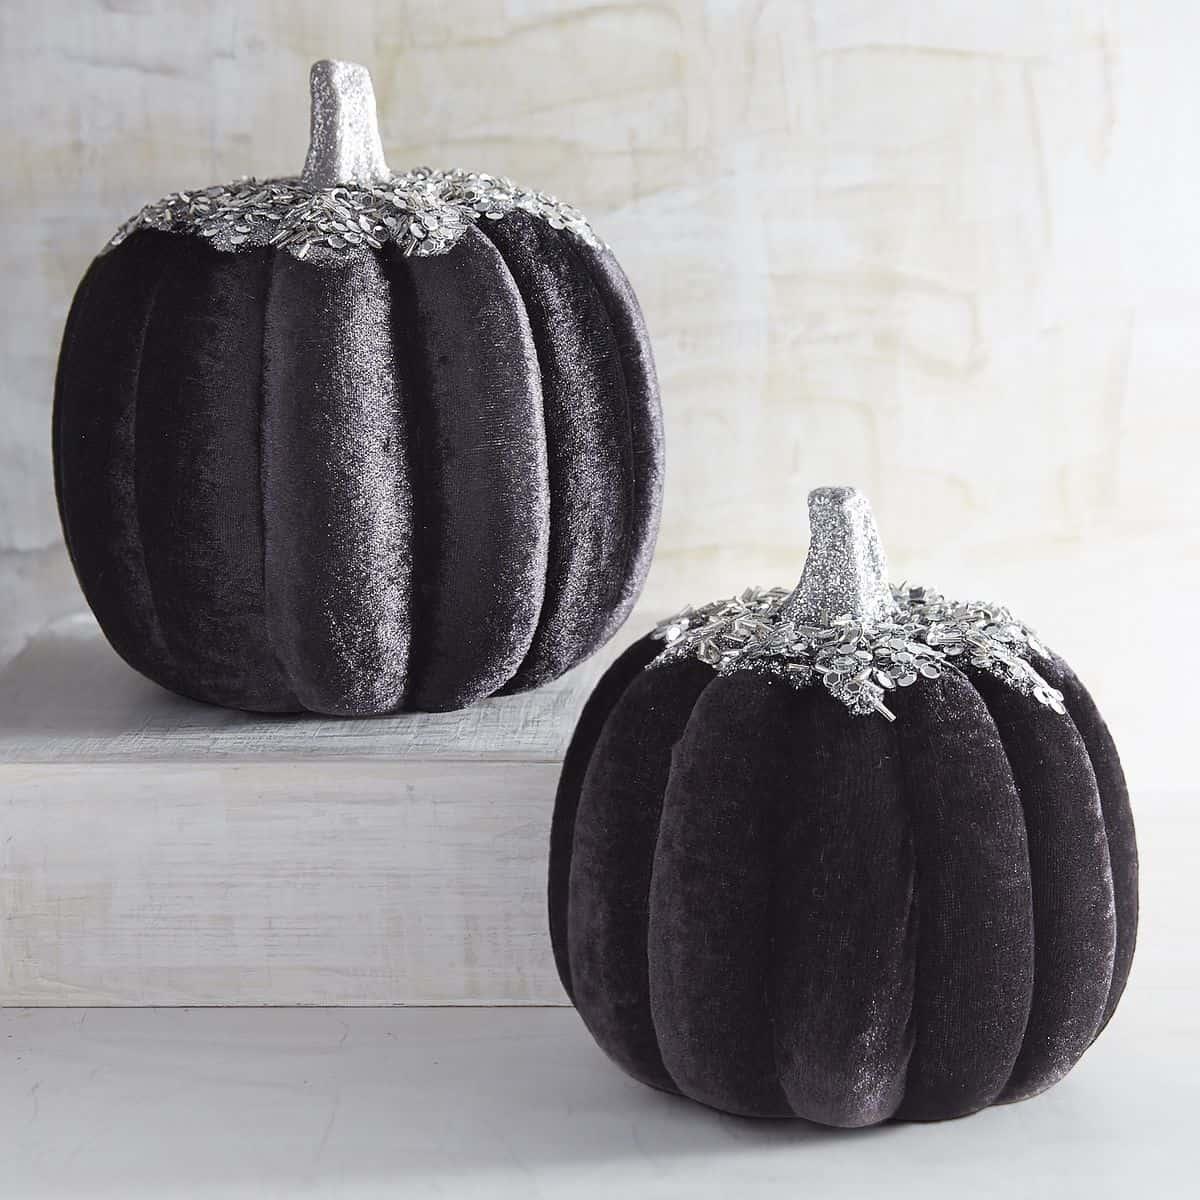 Sequined Velvet Pumpkins